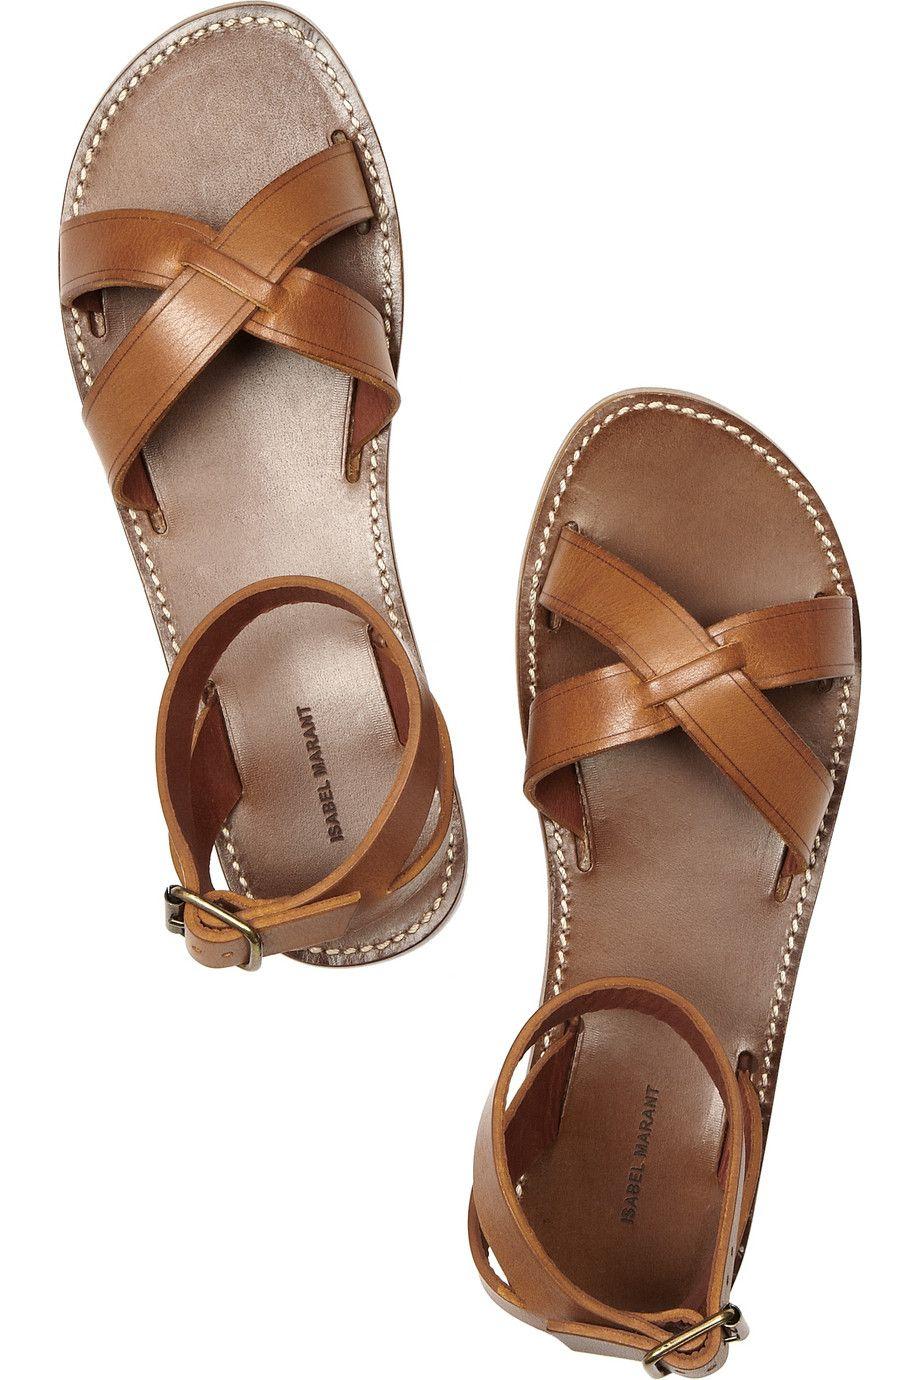 eb5e2df0b7875 Isabel Marant Merry leather sandals...sweet.